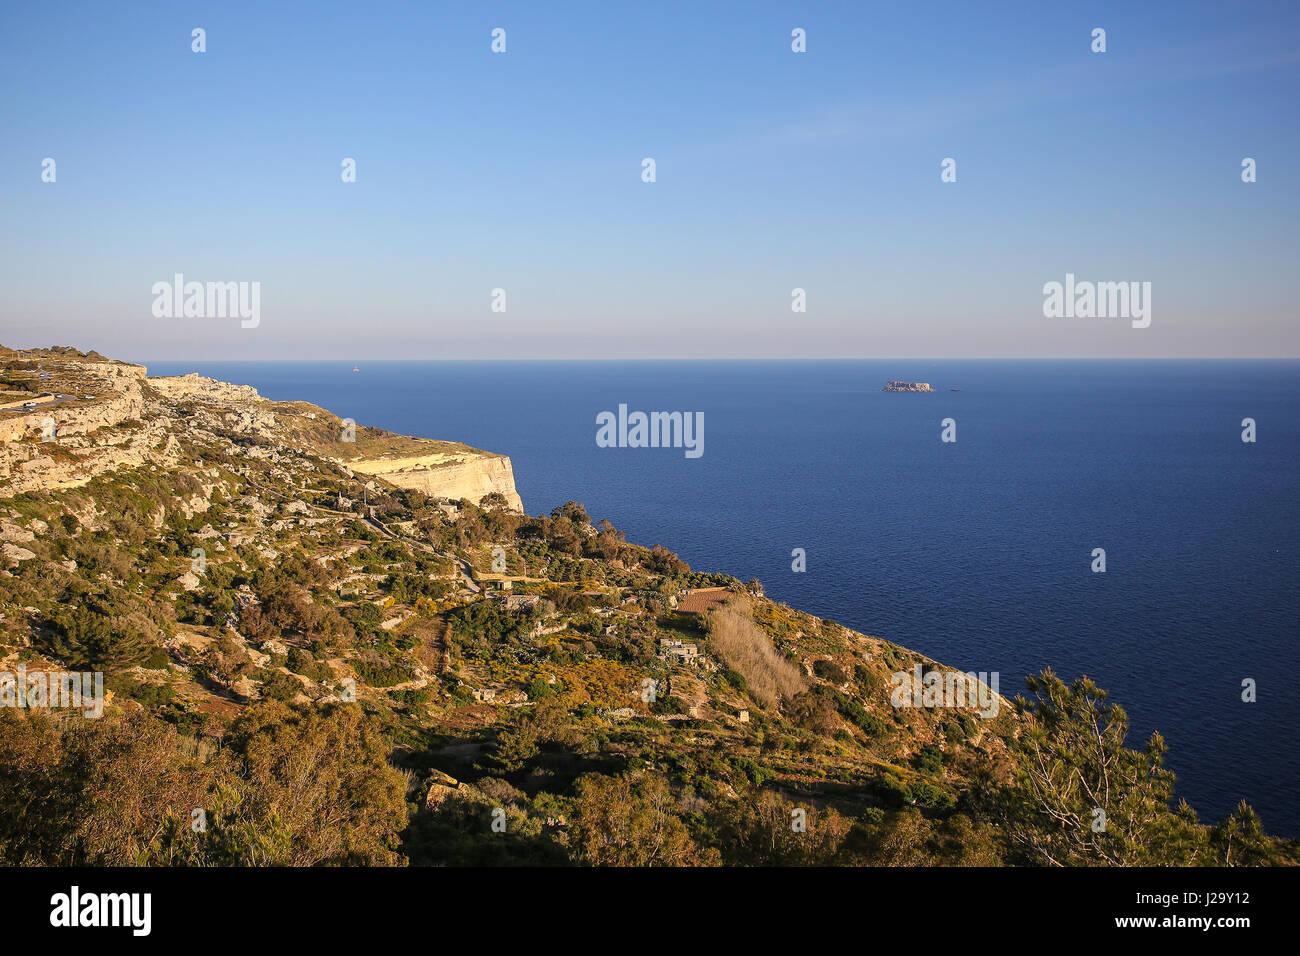 Cliffs of Dingli, Malta - Stock Image